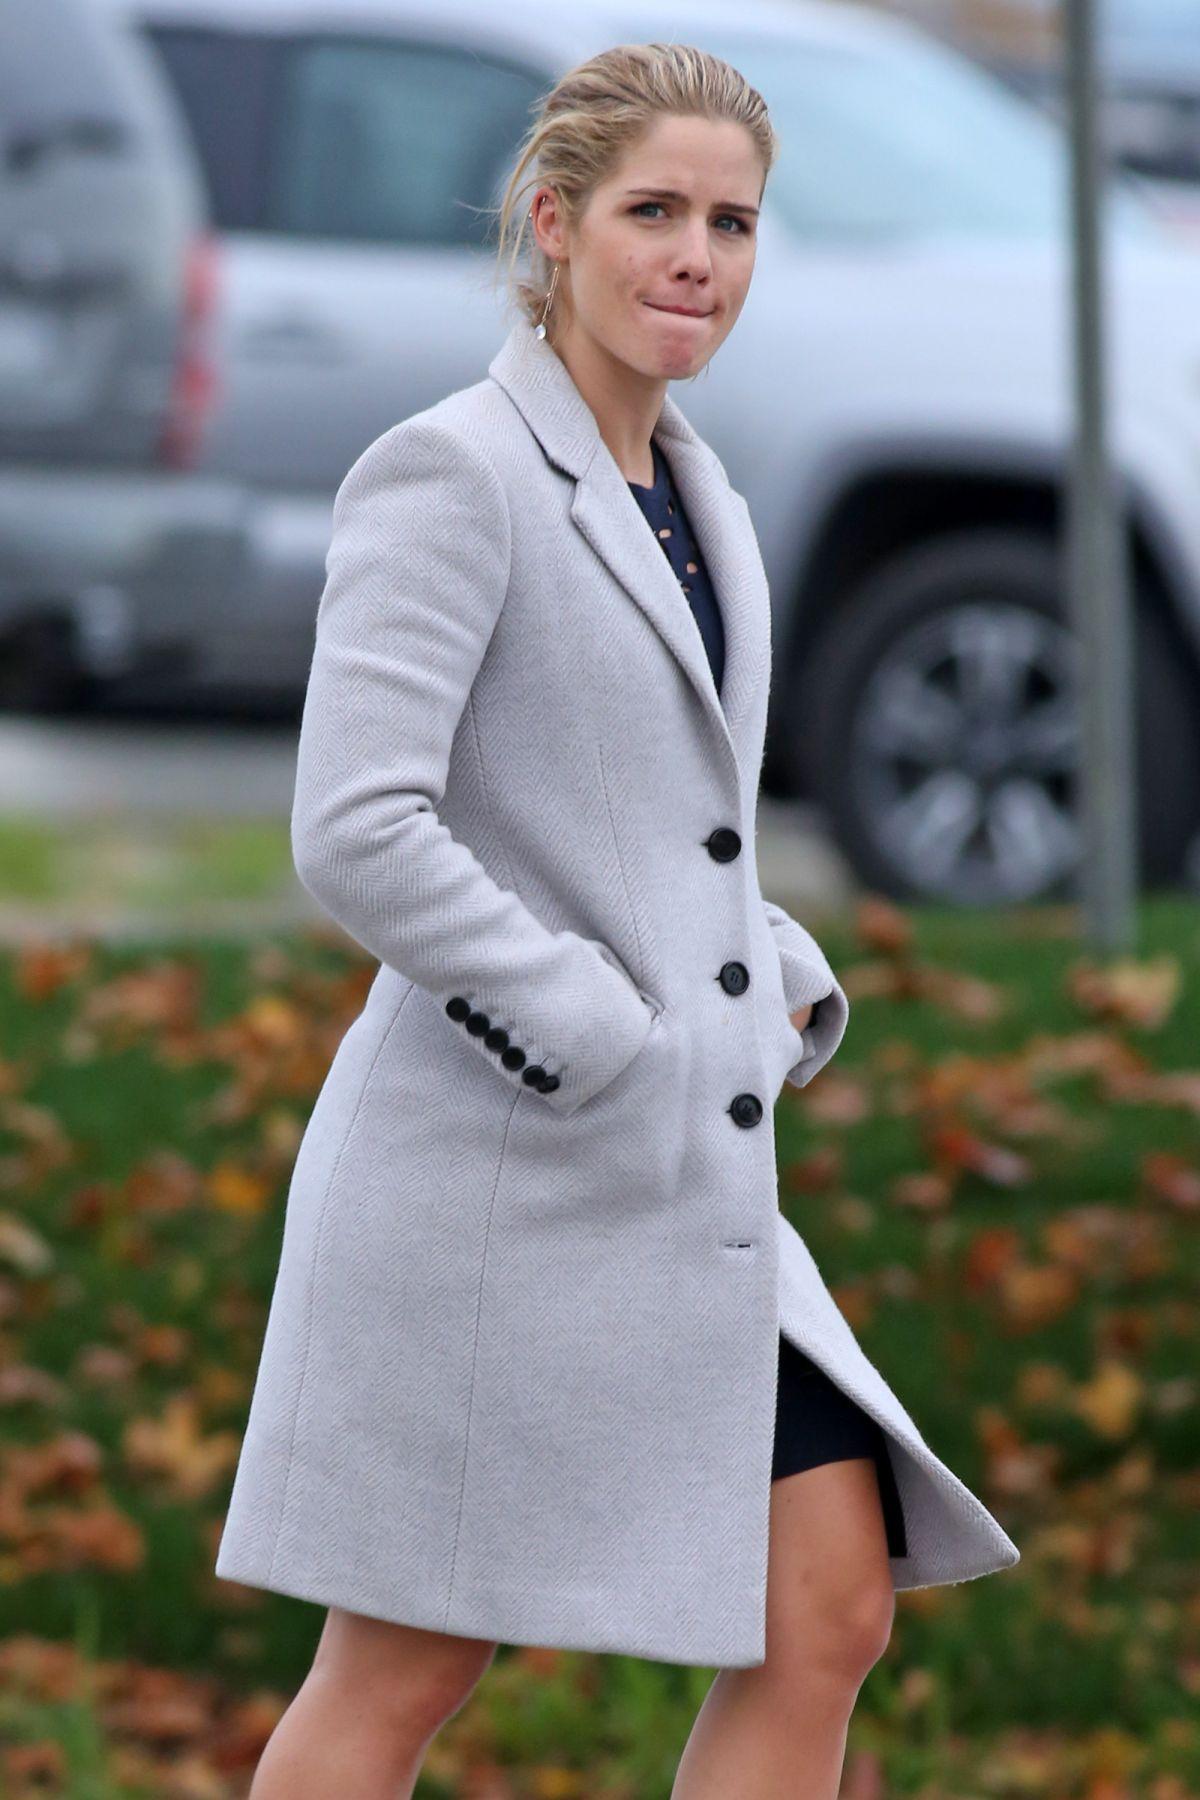 EMILY BETT RICKARDS Arrives on the Set of 'Supergirl' in Delta 10/12/2016